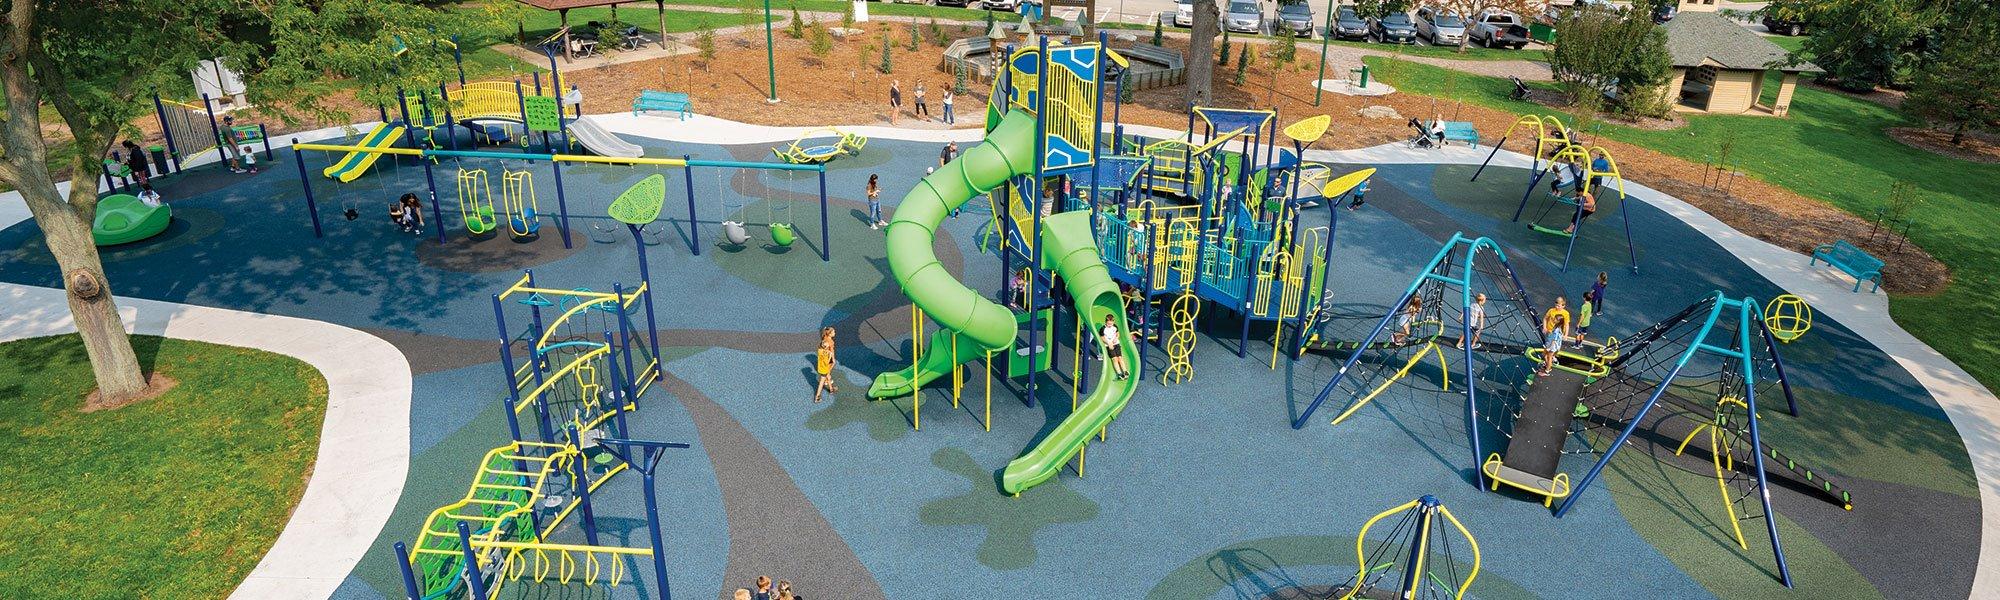 Playground Design Search